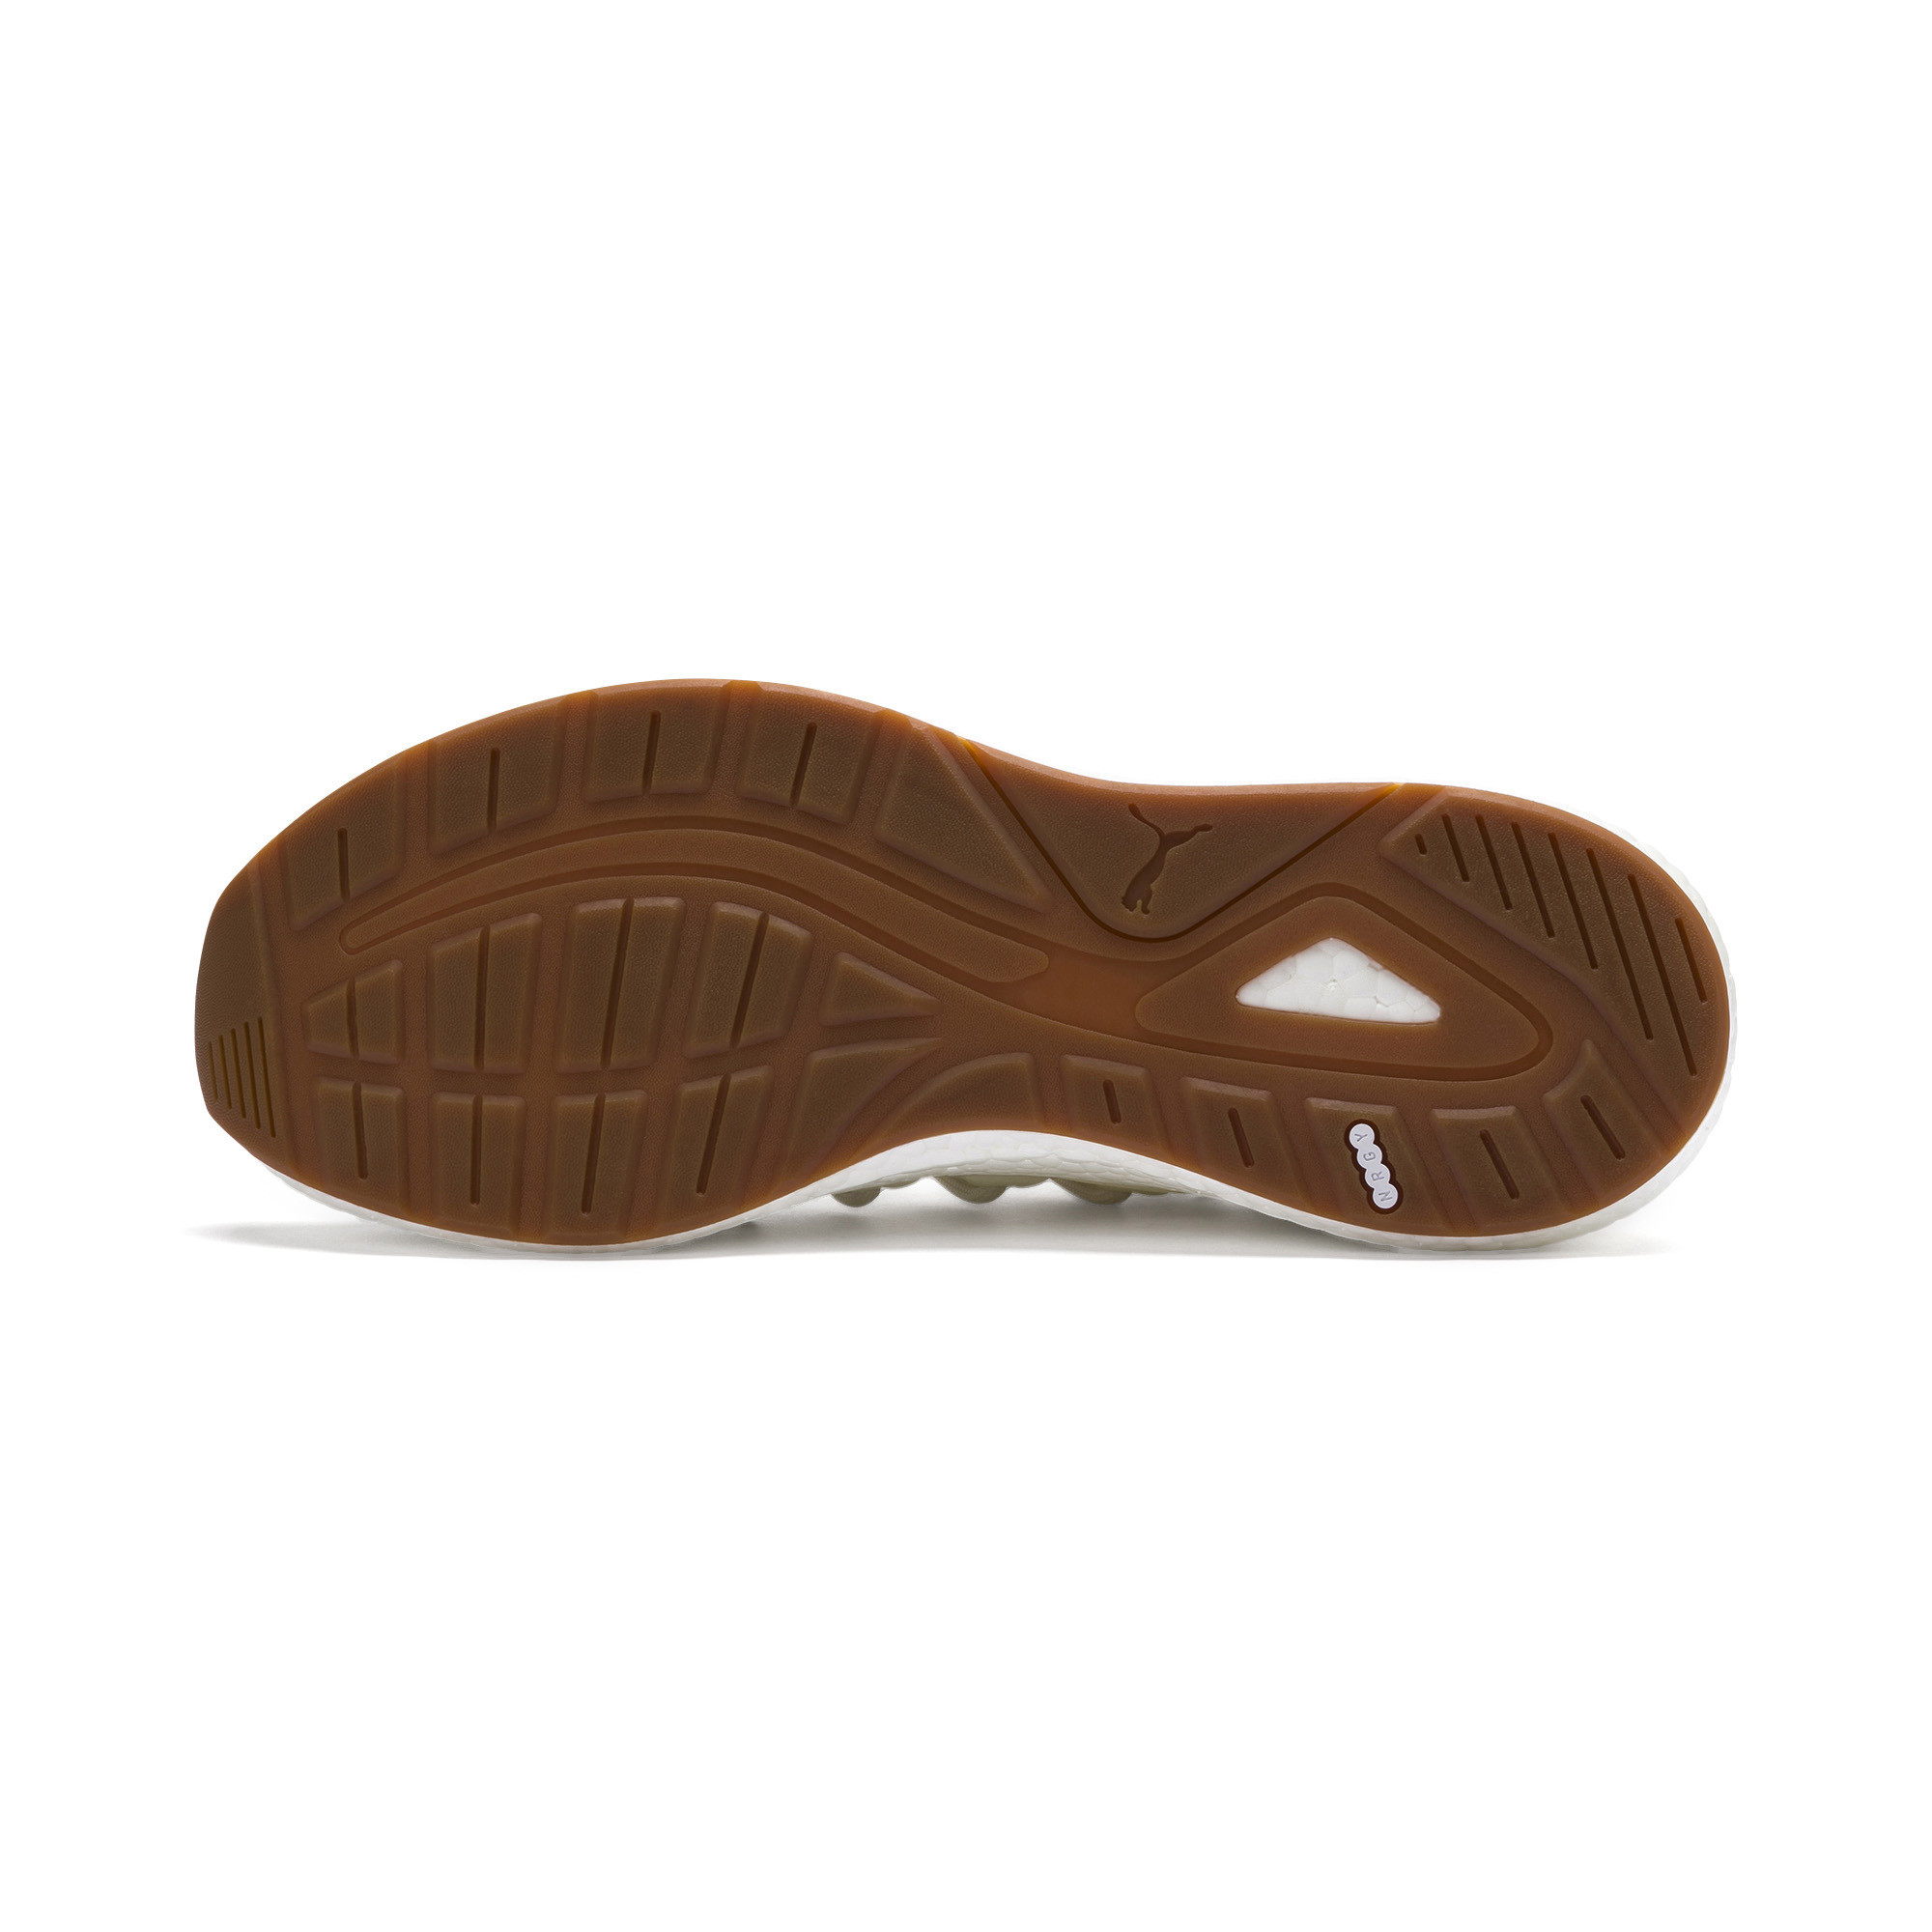 PUMA-NRGY-Neko-Future-Men-s-Running-Shoes-Men-Shoe-Running thumbnail 5